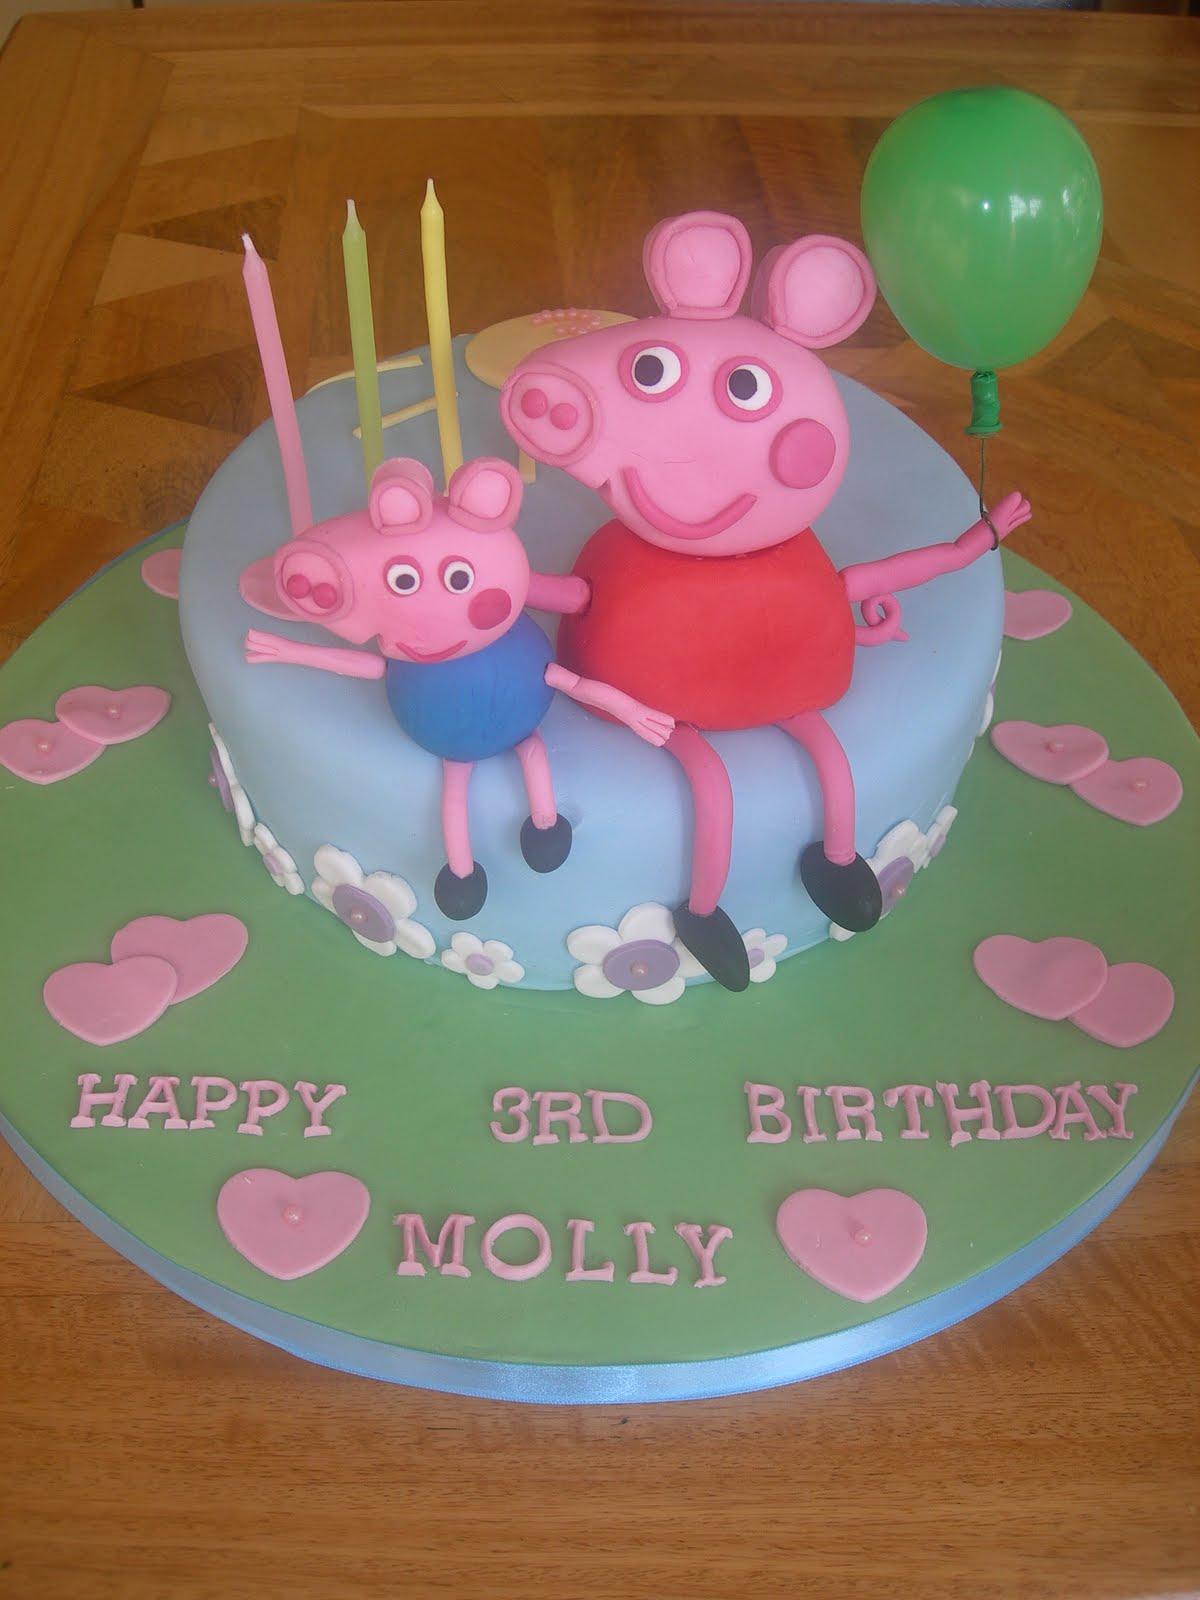 Custom Cake Designs Uk : Custom Cake Design: Peppa pig cake